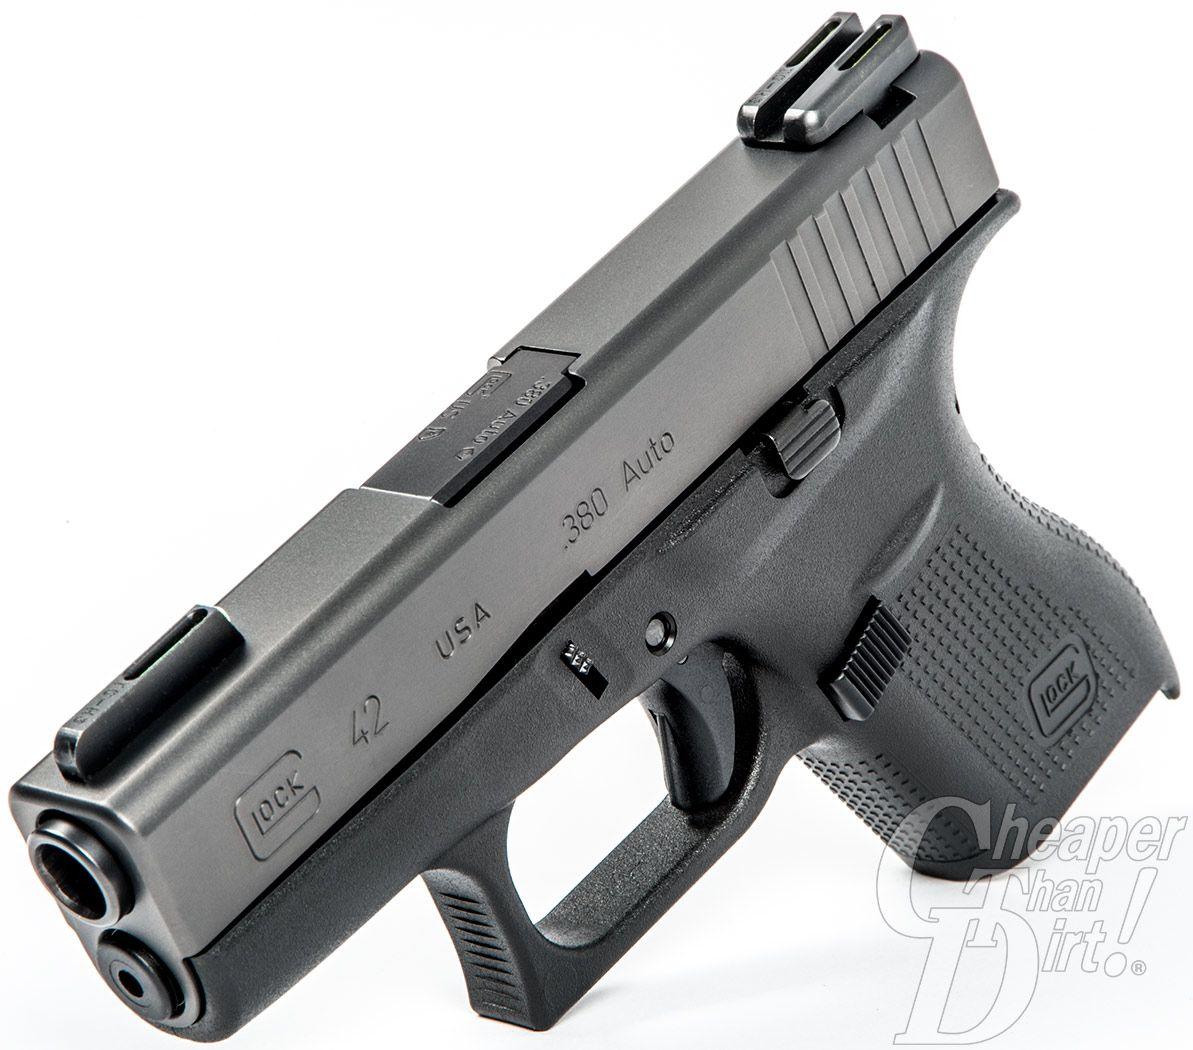 JPX4 4 Shot Pepper Gun Compact | Conceal carry, Guns and Google